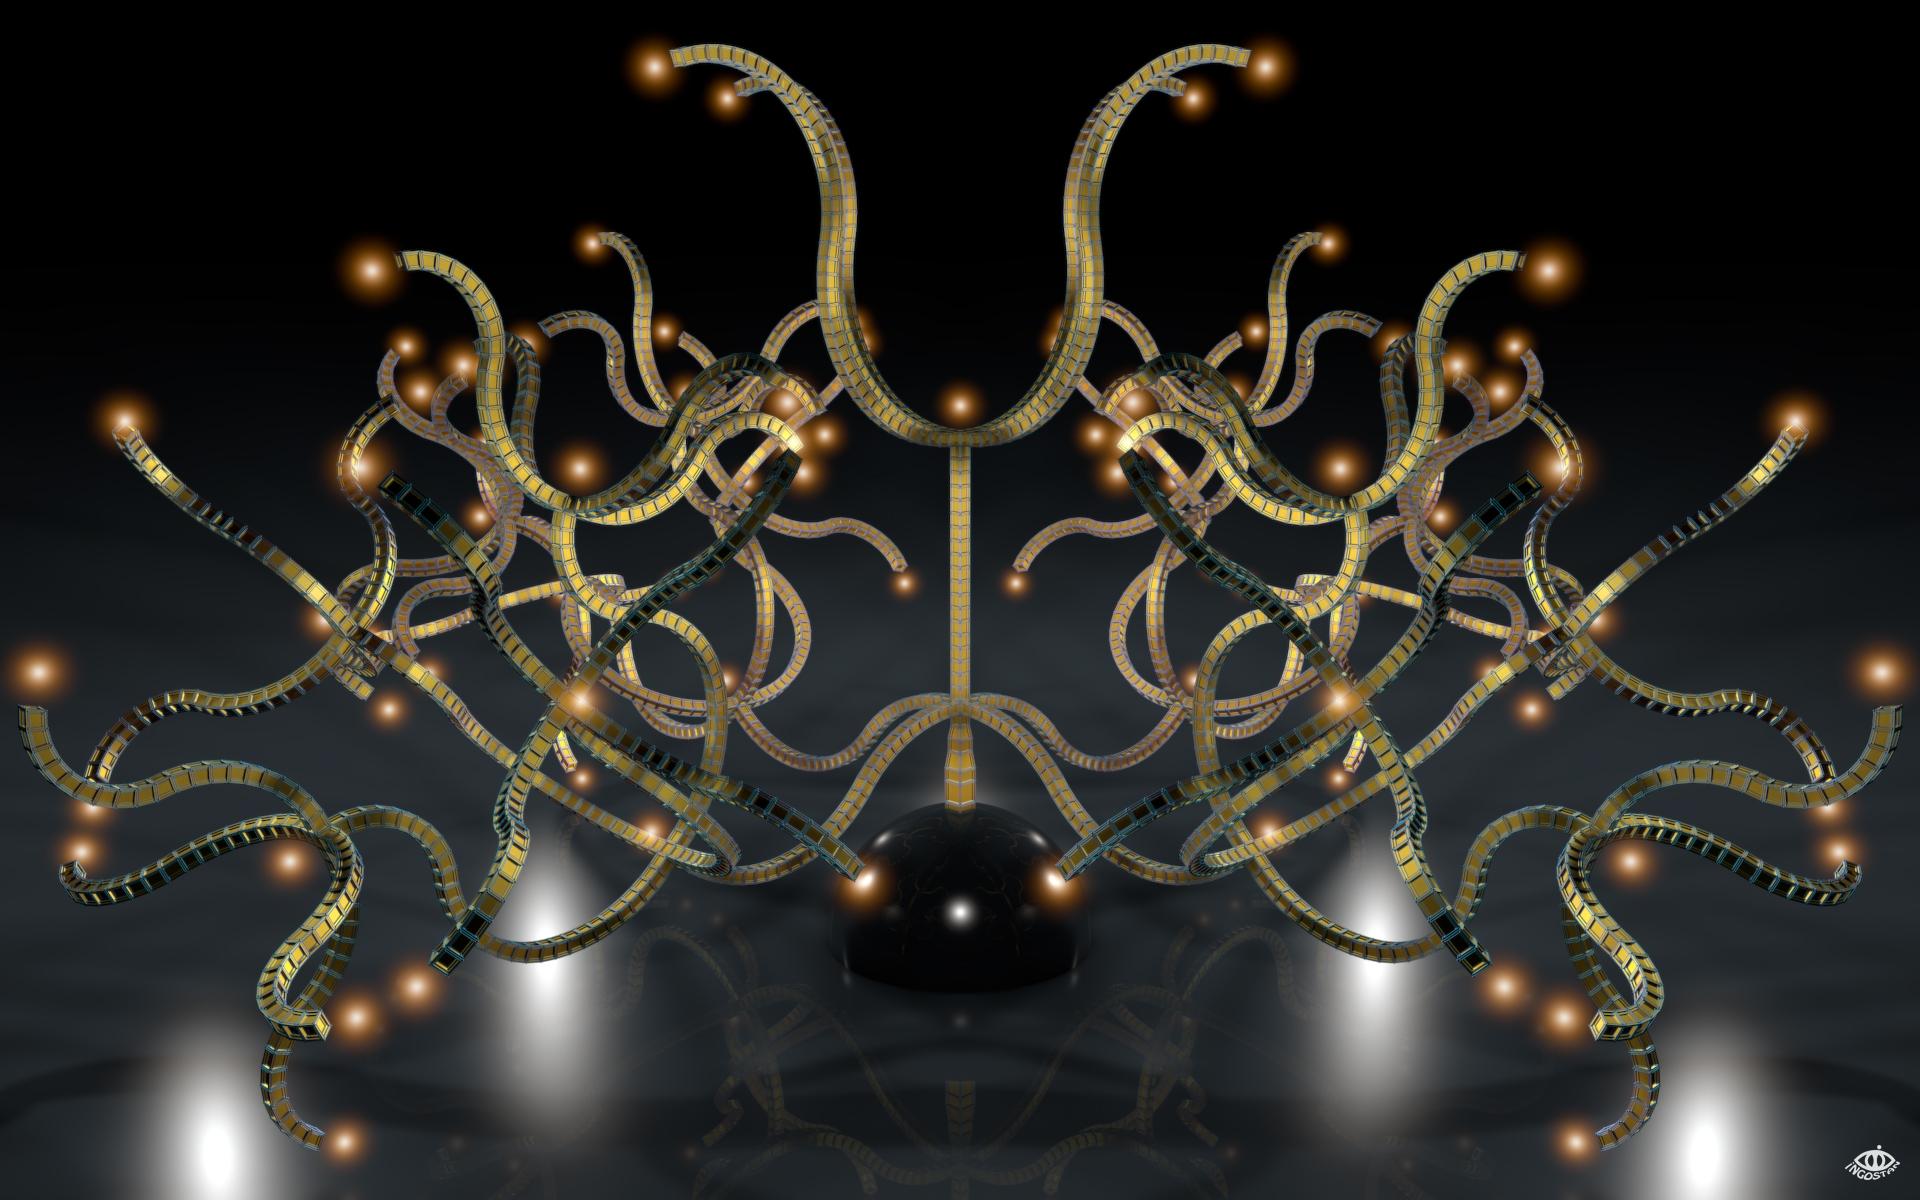 Abracadabra Candelabra by Ingostan